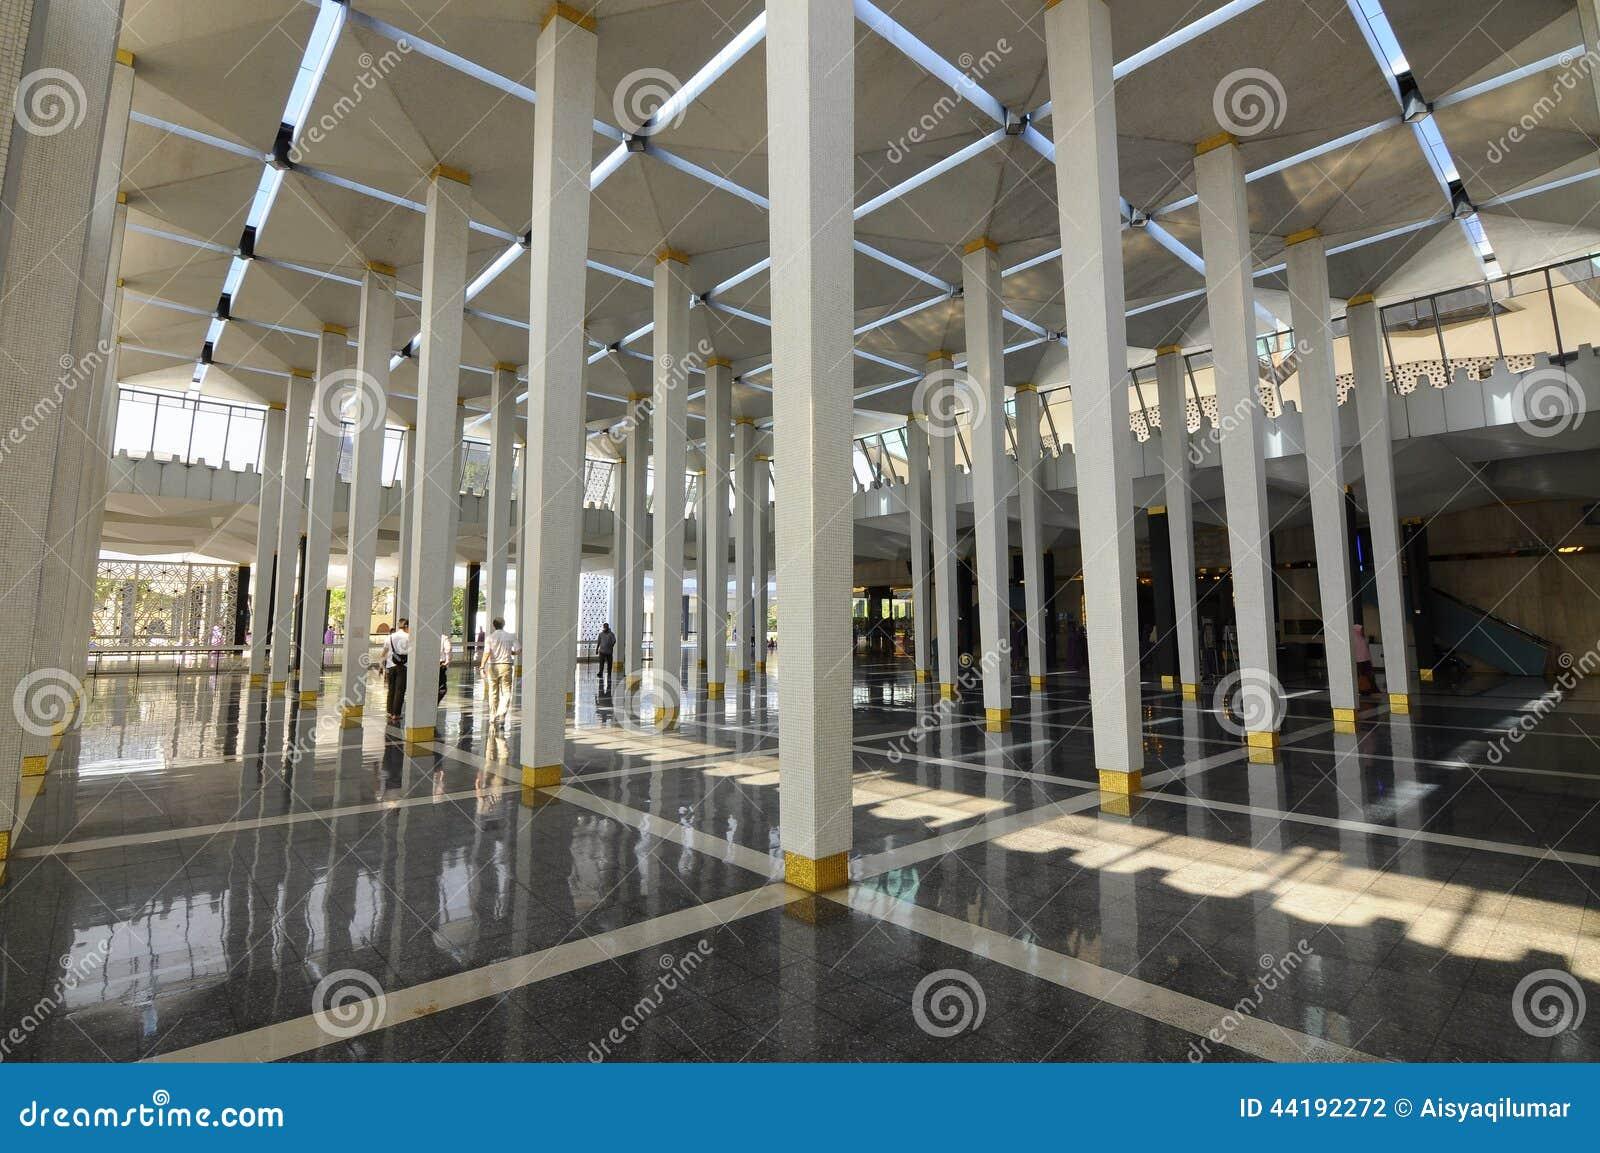 Can Non Muslims Build A Masjid